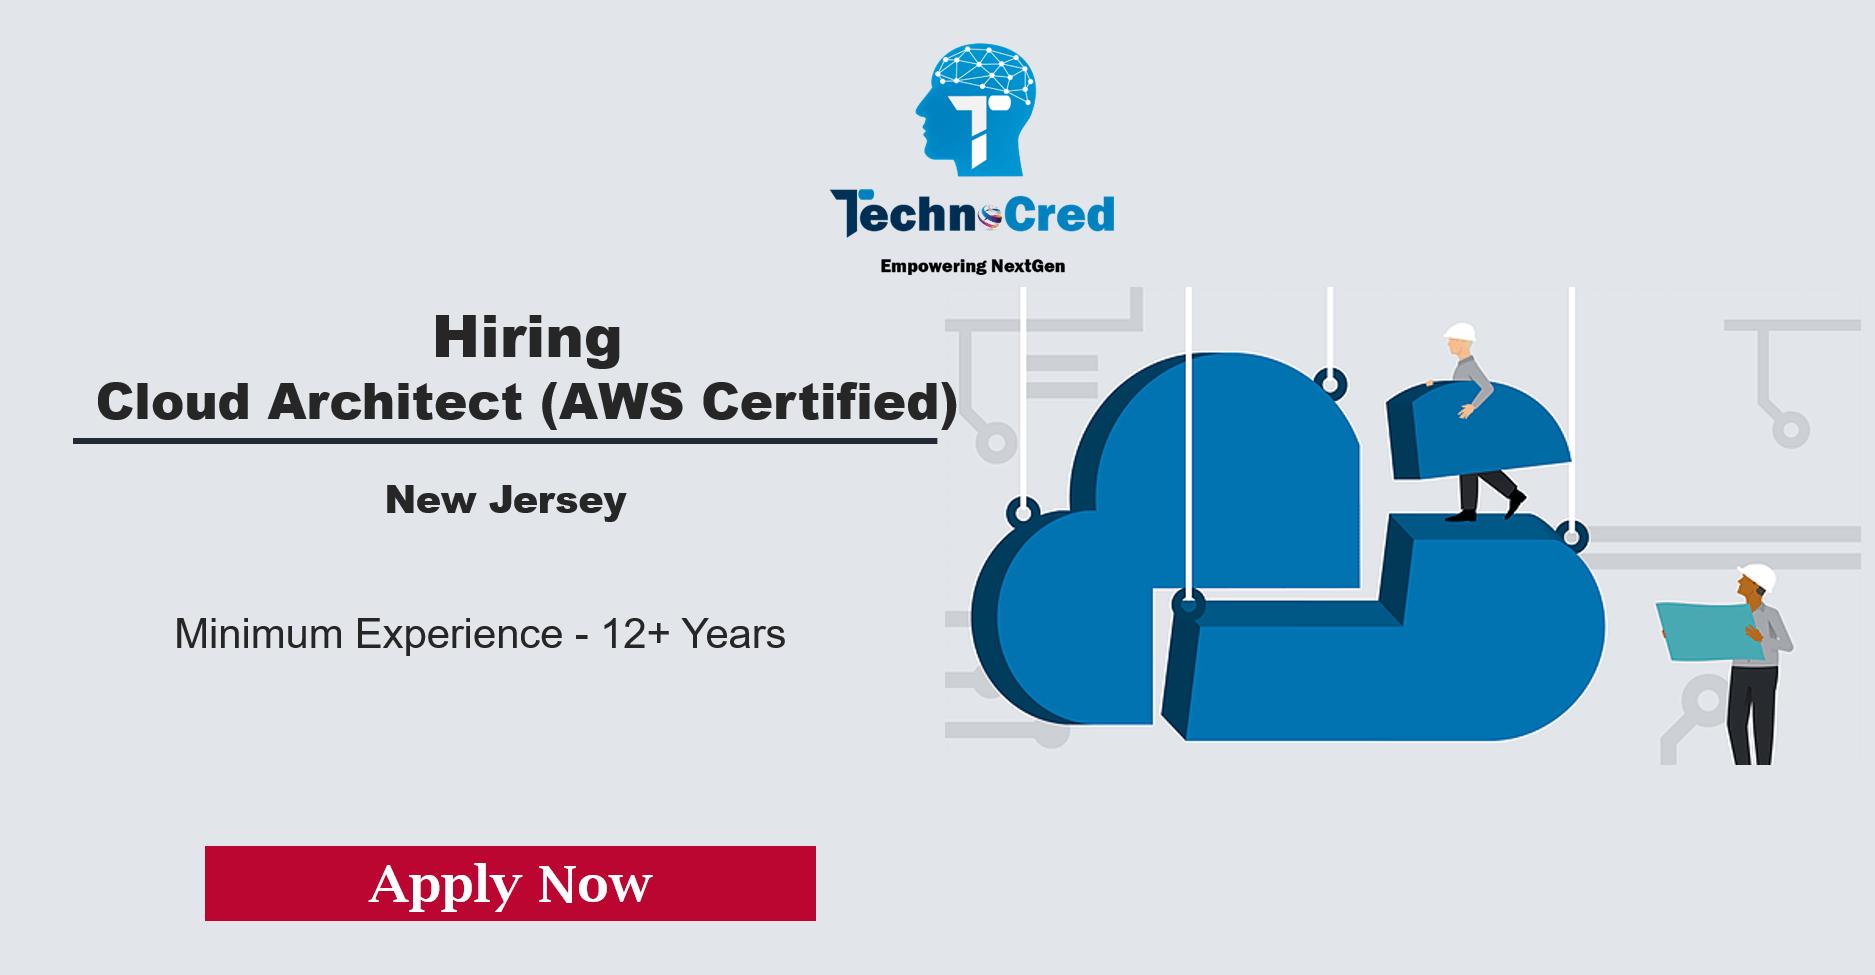 Hiring Cloud Architect (AWS Certified)